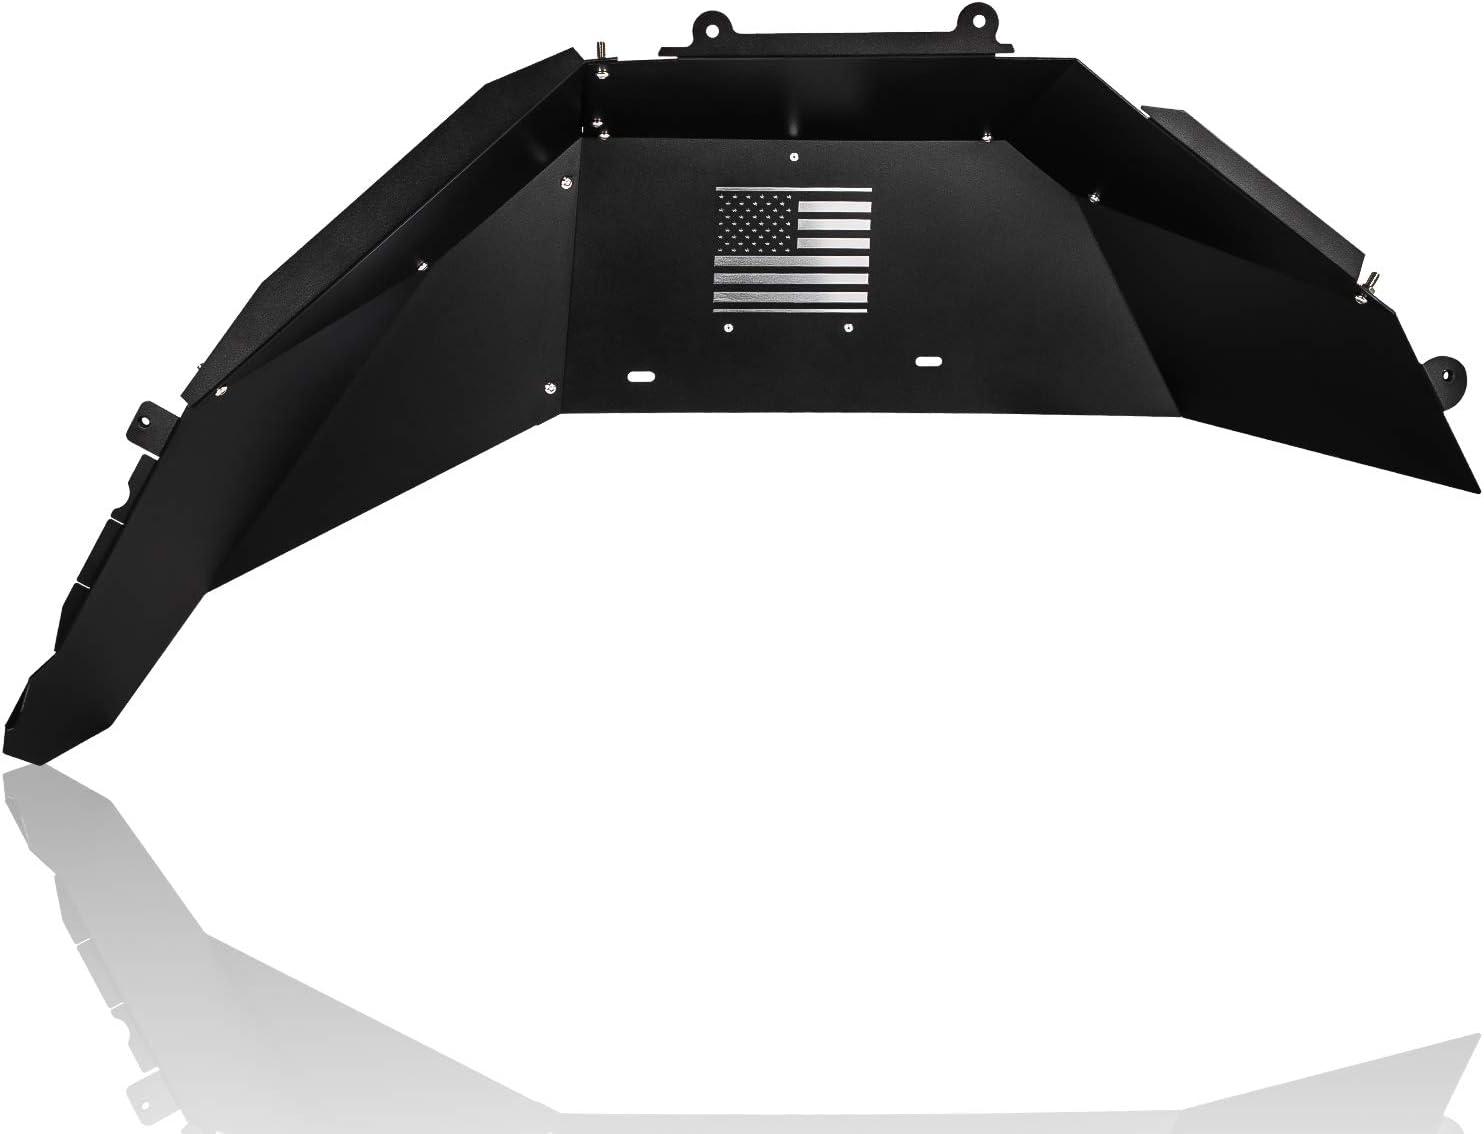 2PCs Rear Inner Fenders Liner Kit Fender Flares Protector with US Flag Custom Fit for Jeep Wrangler JL 2018-2020 4WD